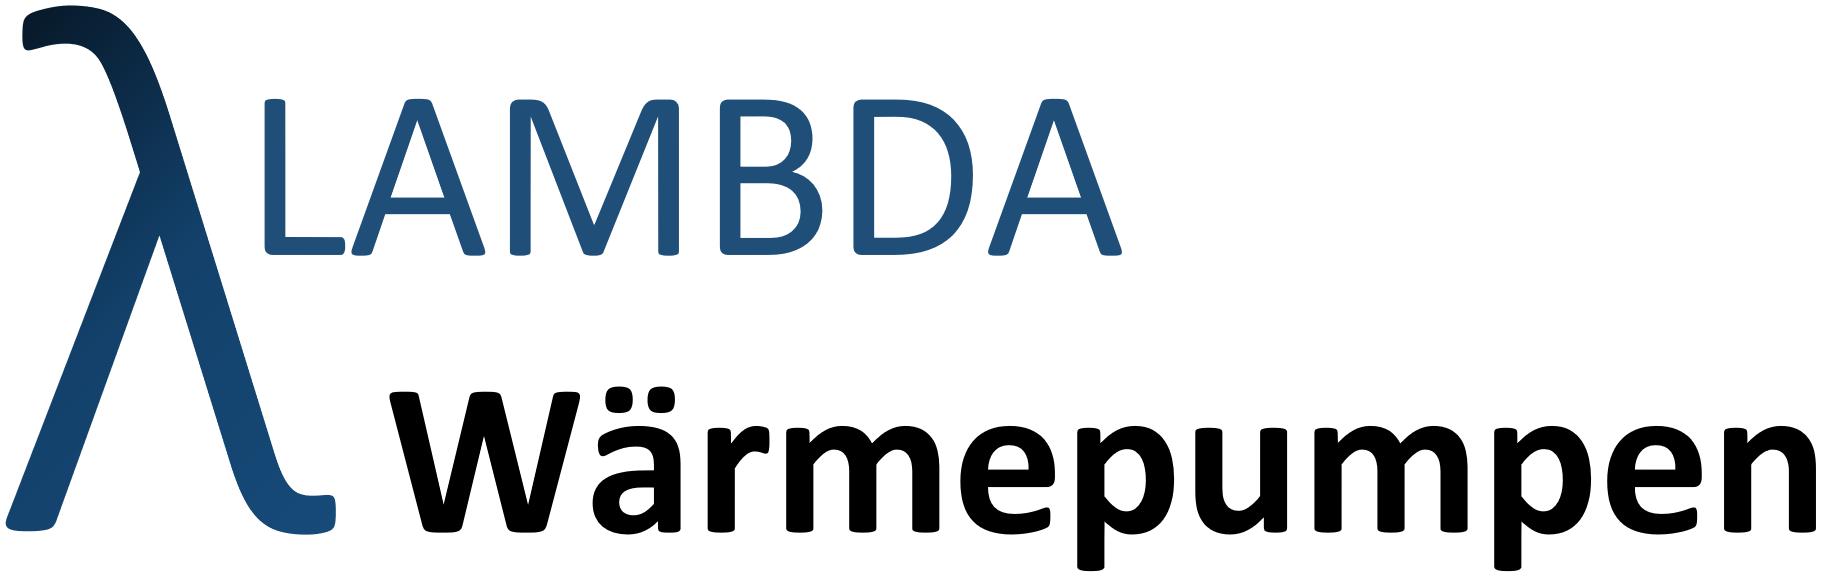 LAMBDA Wärmepumpen